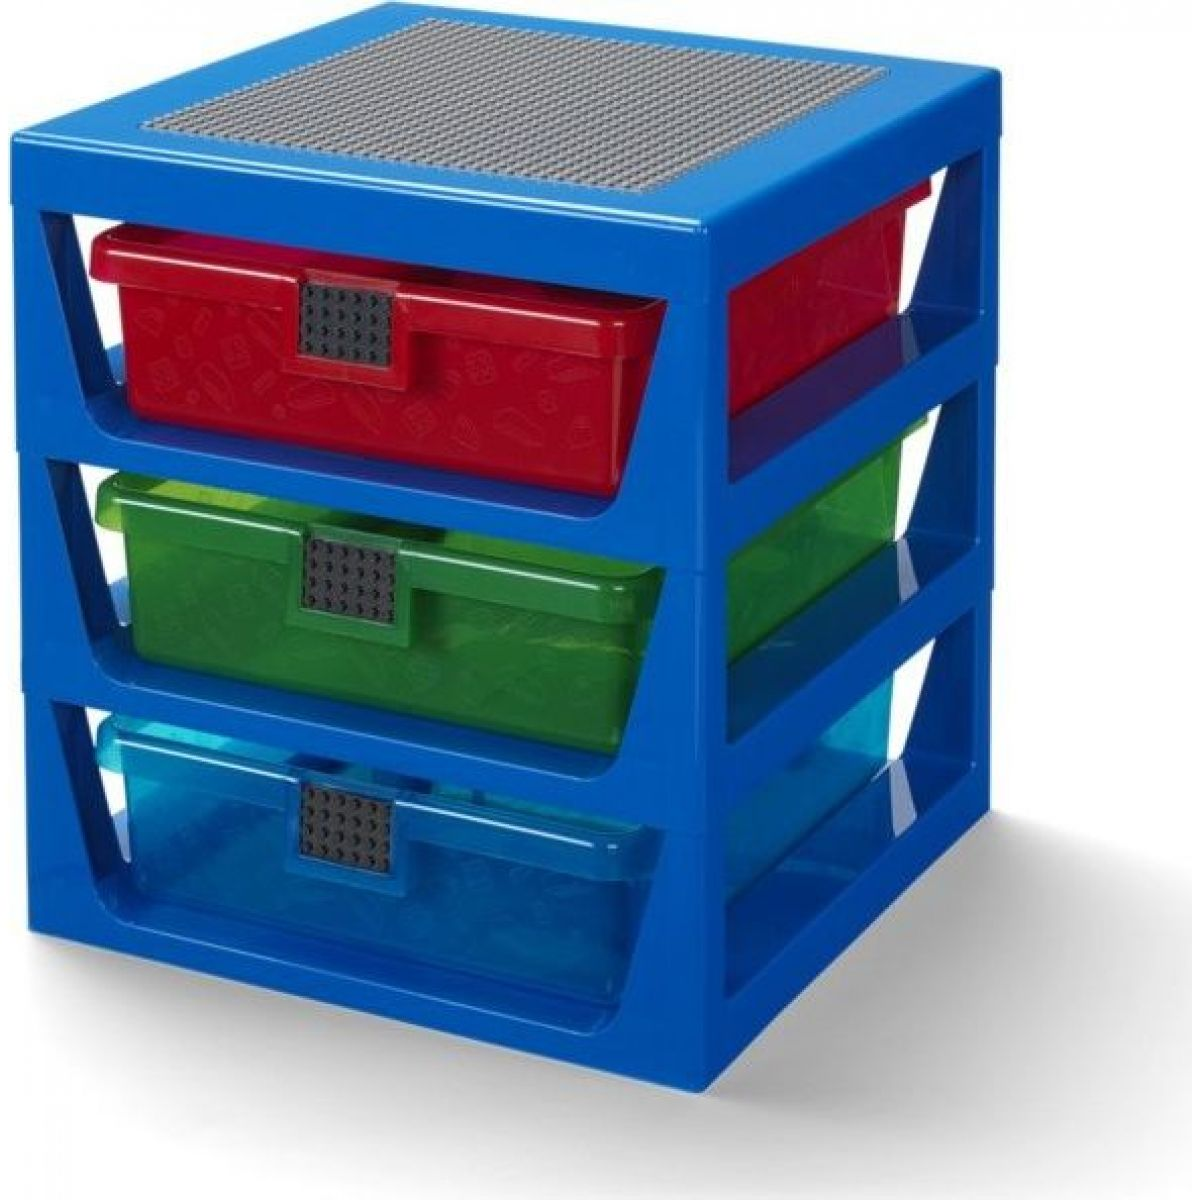 LEGO® organizér se třemi zásuvkami modrý